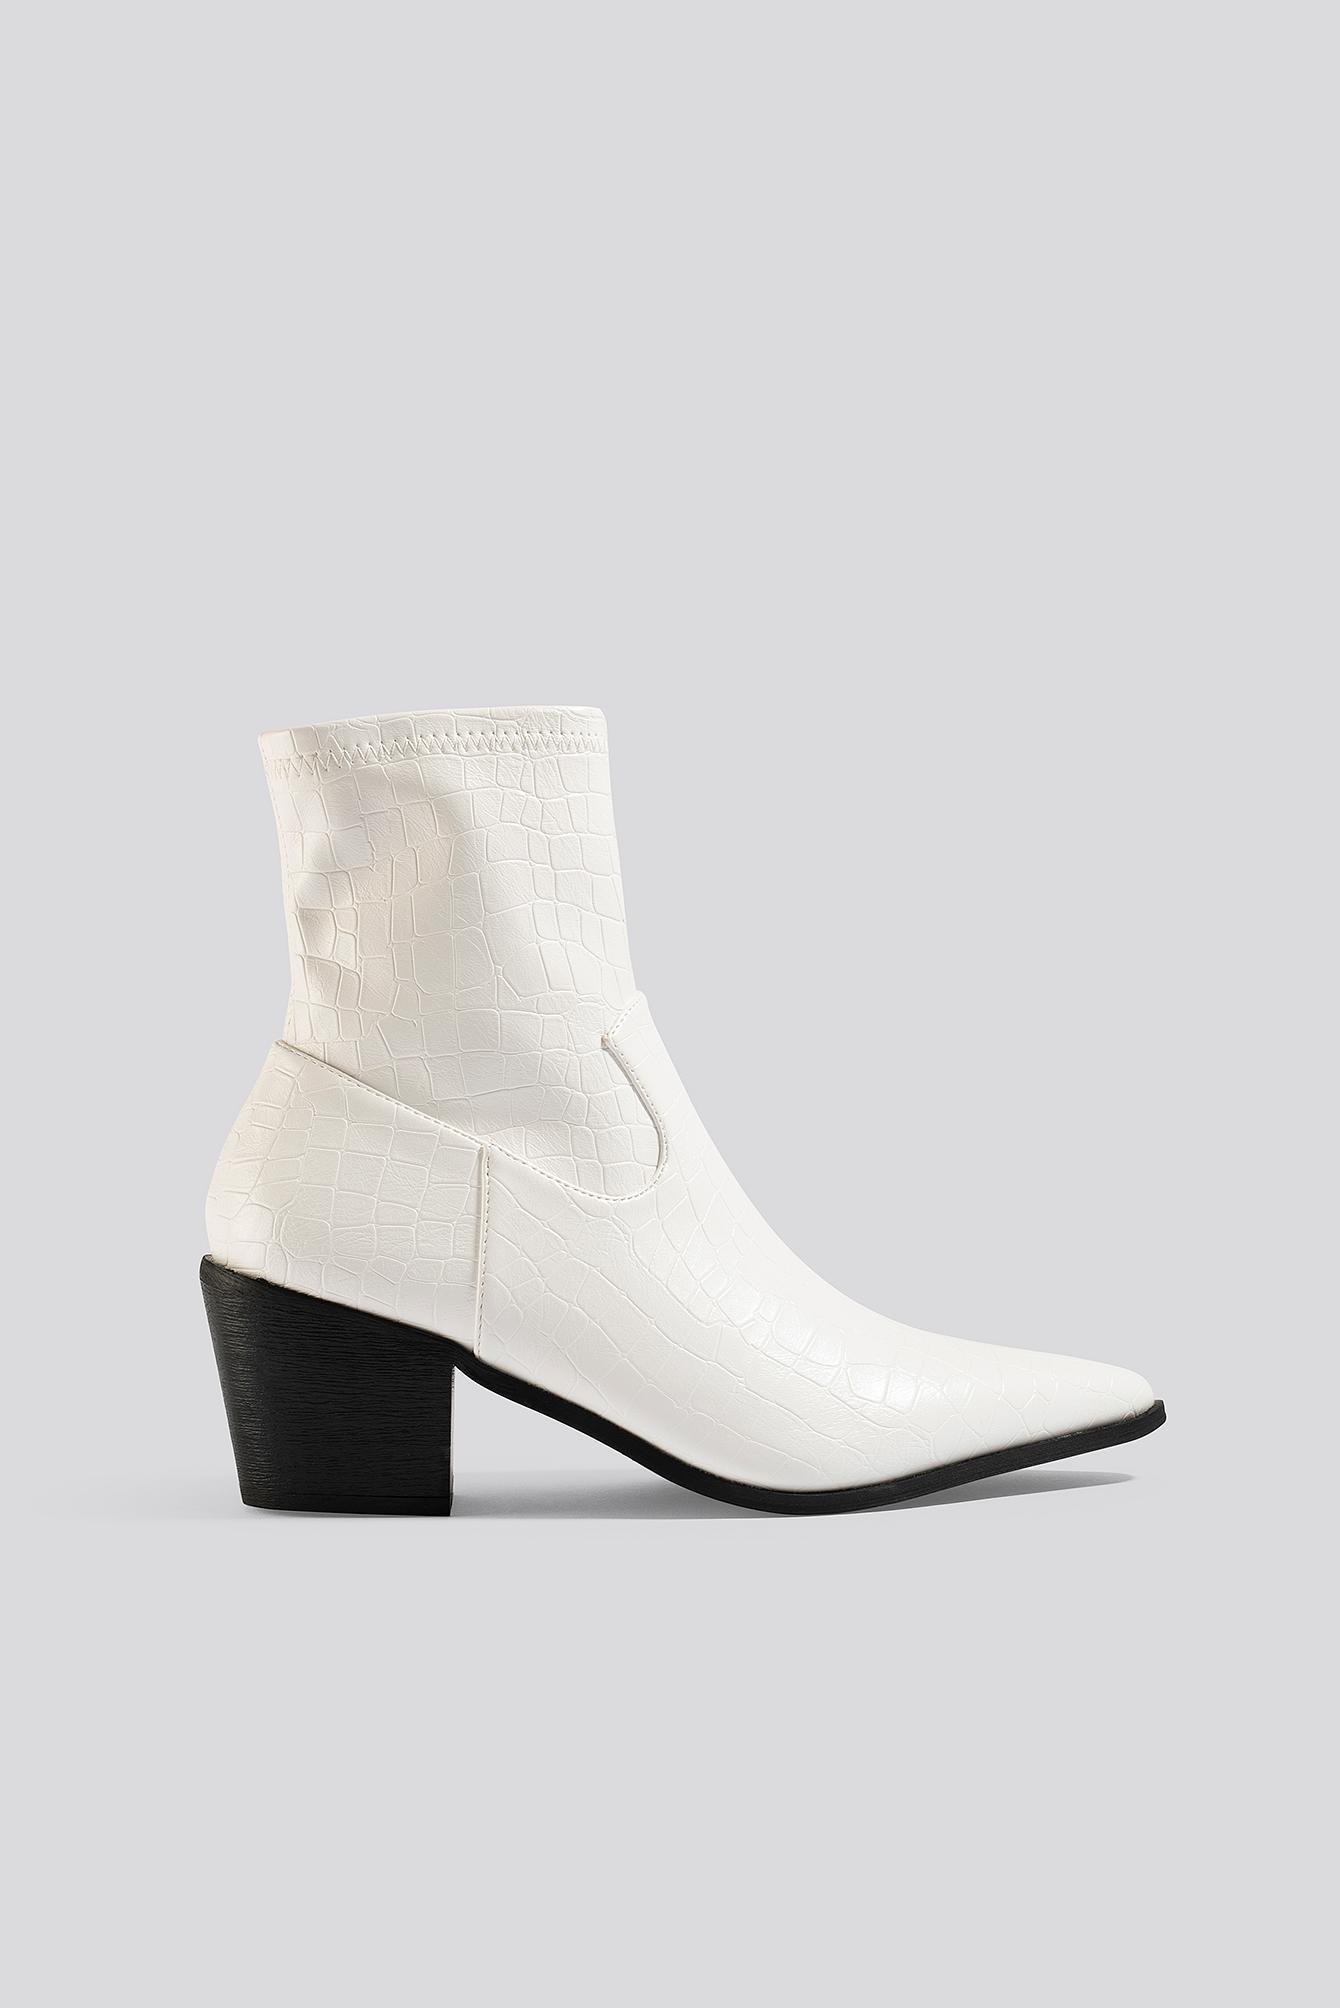 raid -  Mira Ankle Boots - White